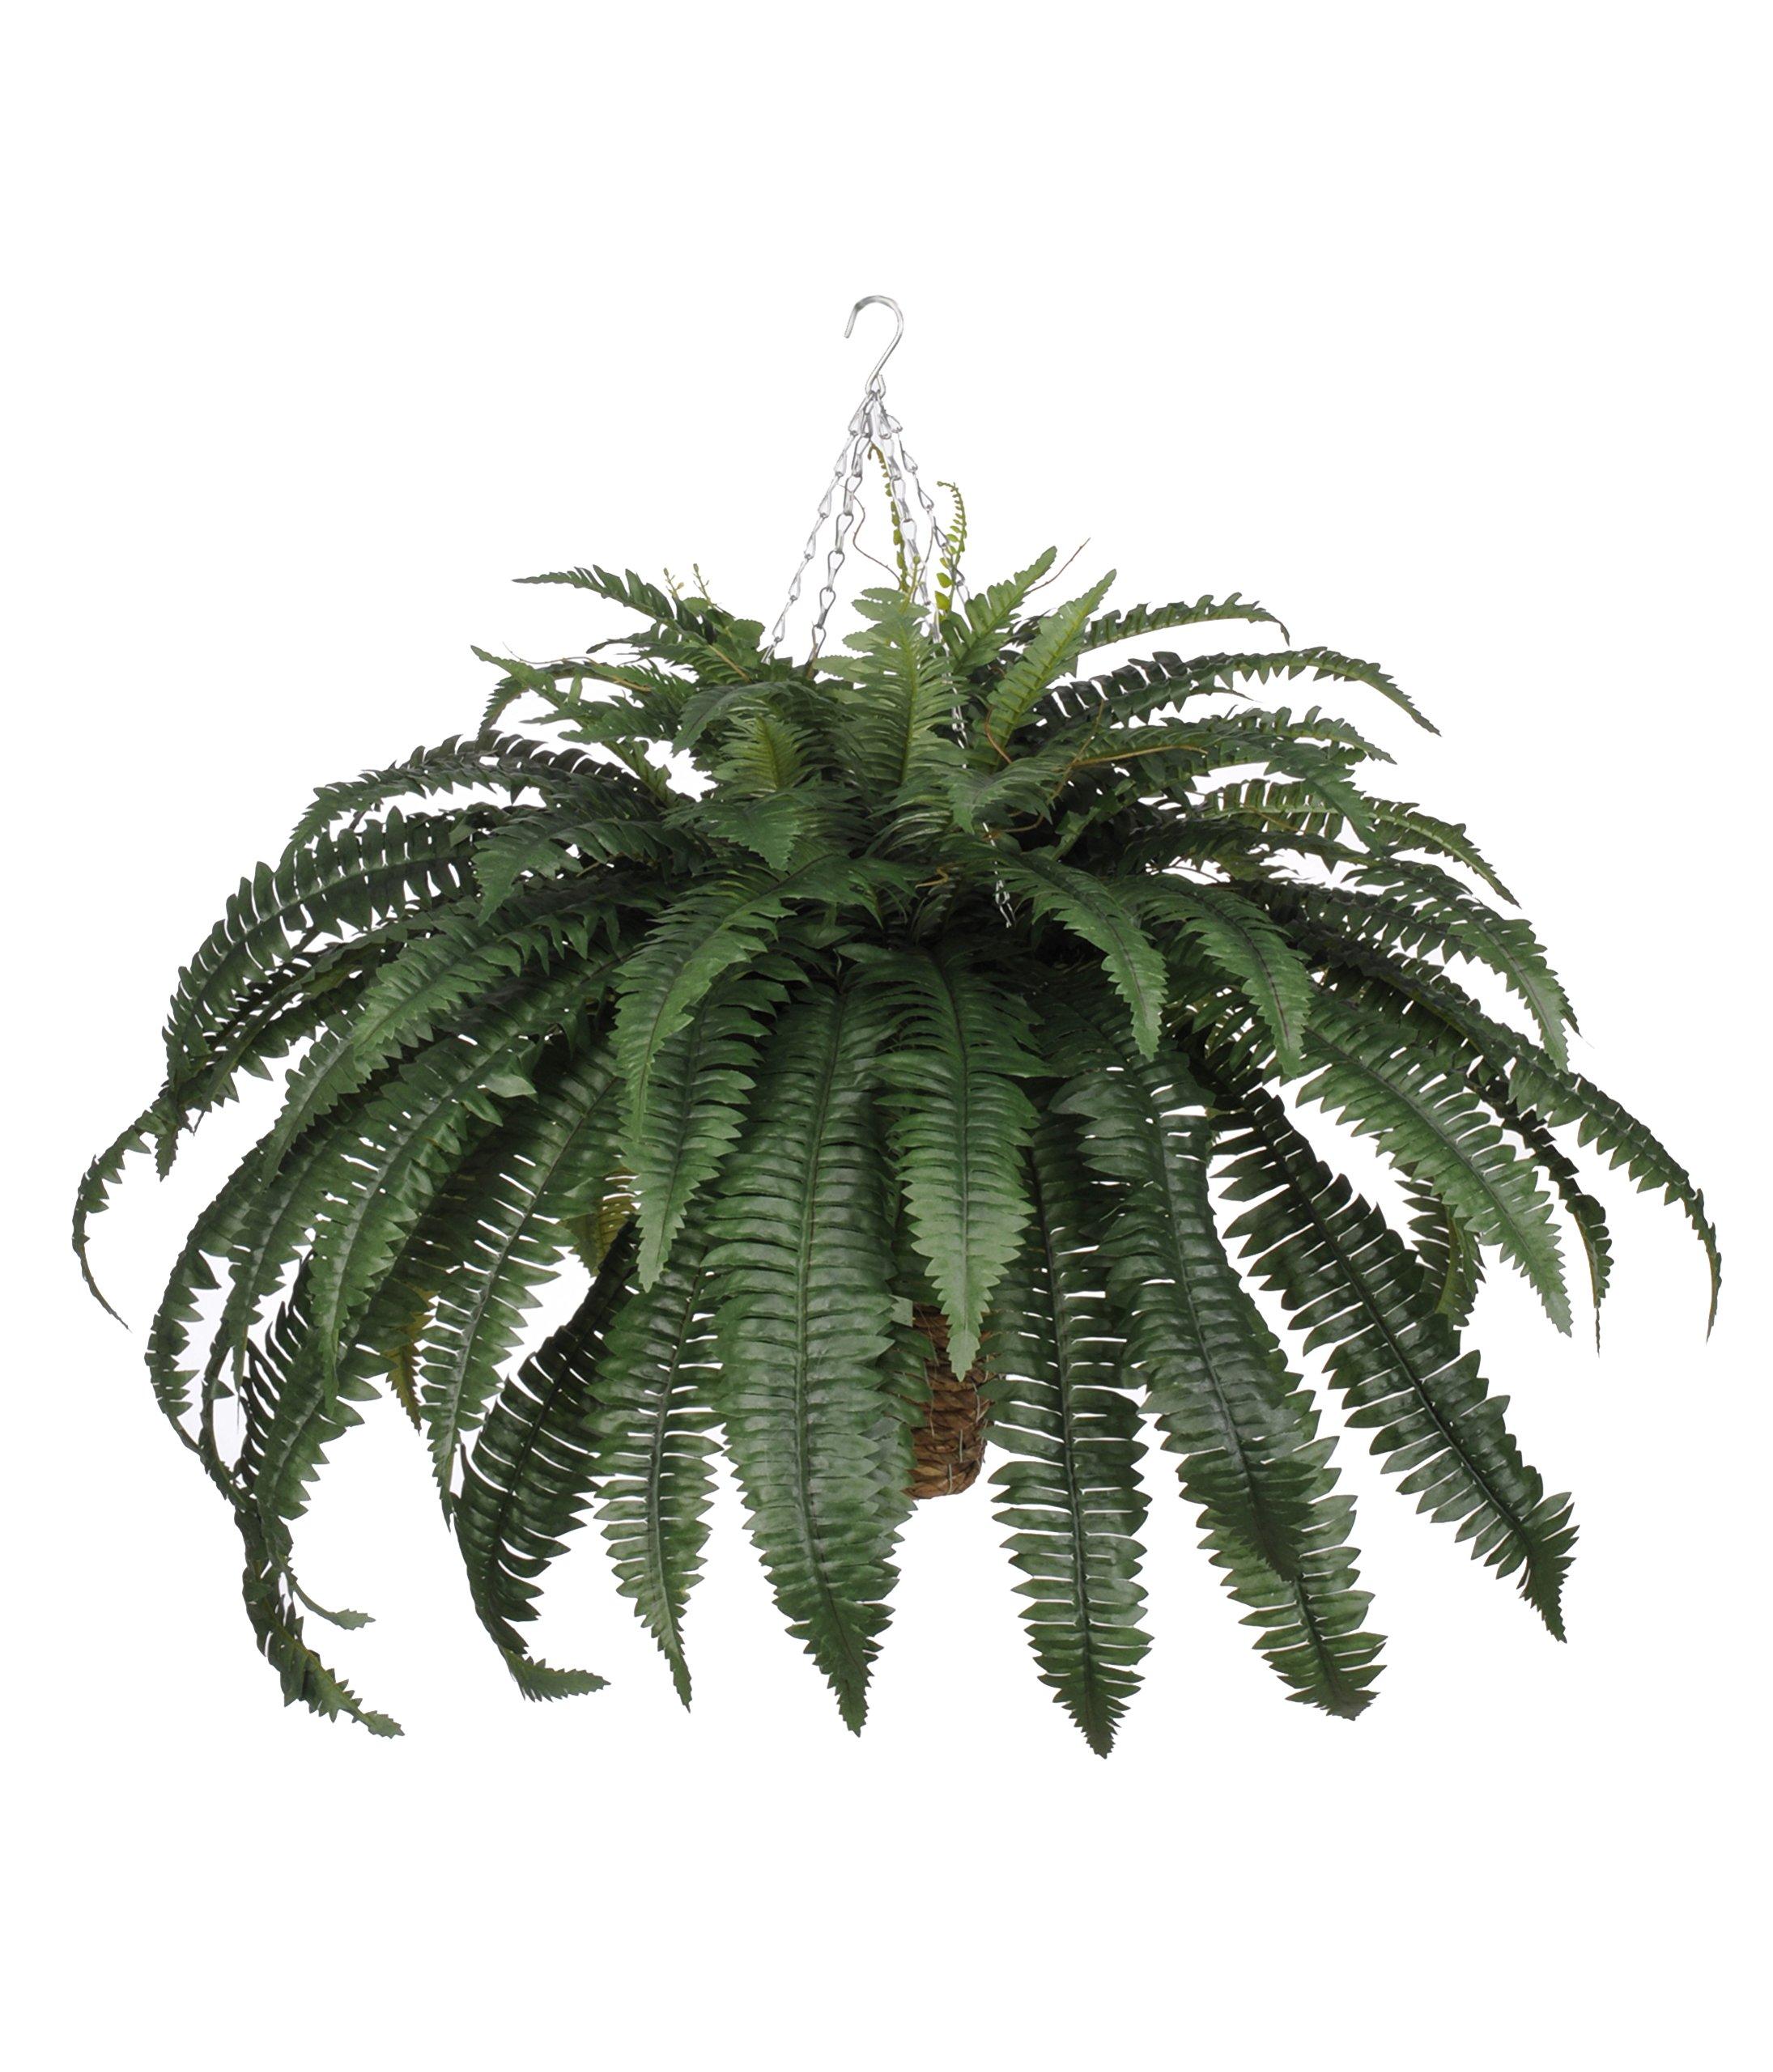 House-of-Silk-Flowers-Artificial-Fern-in-Beehive-Hanging-Basket